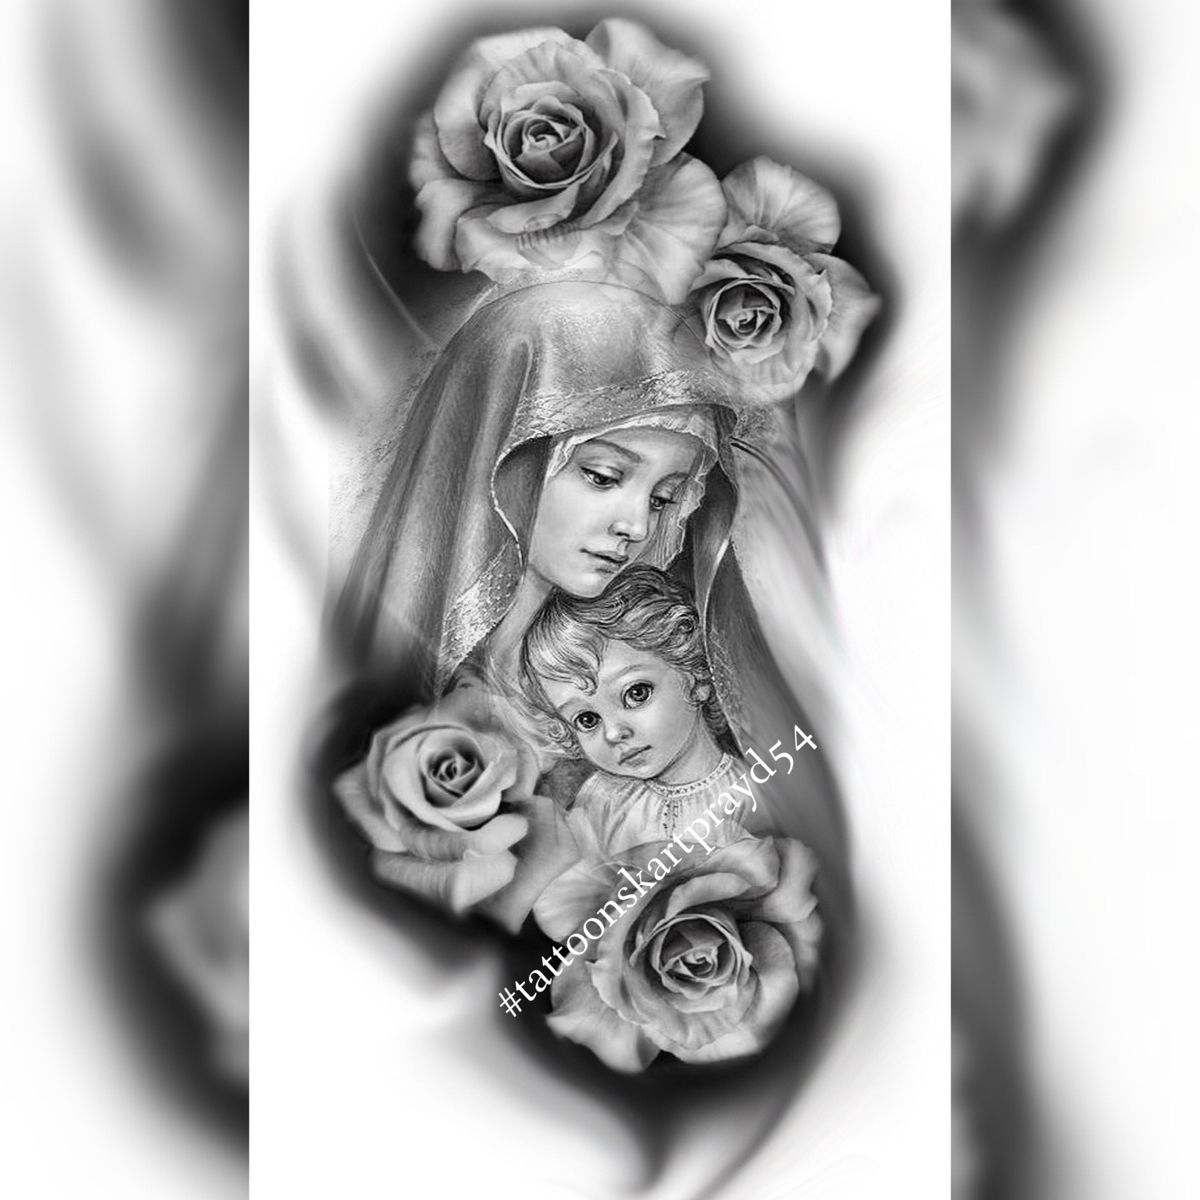 Дева Мария эскиз TATTOO STUDIO Новосибирск (tattoonsk_art